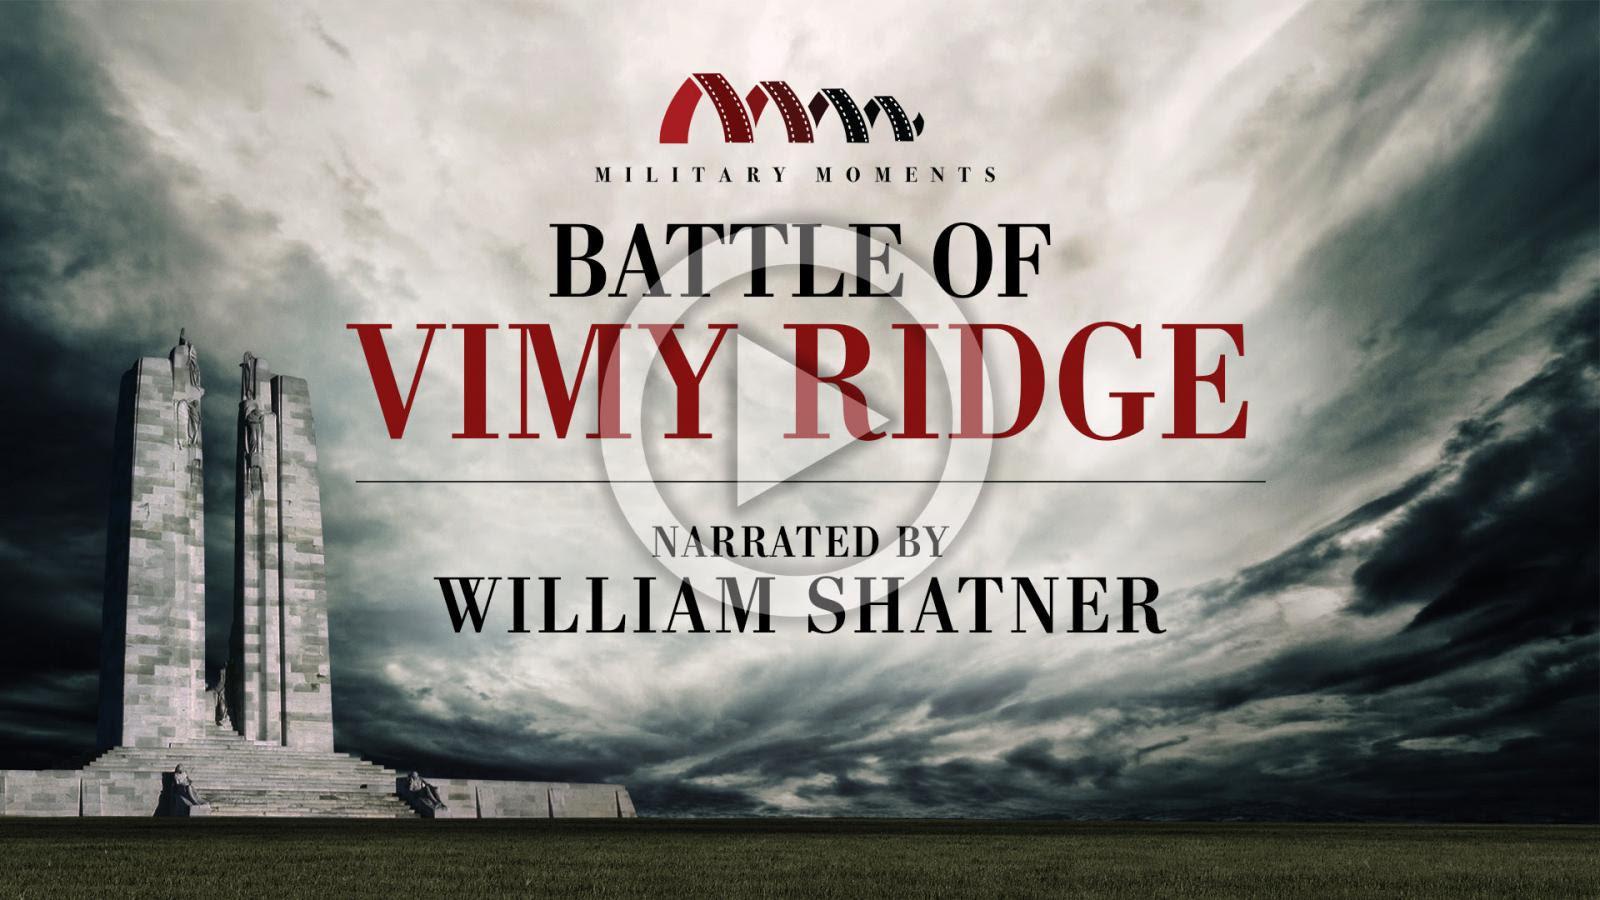 William Shatner Narrated Battle of Vimy Ridge